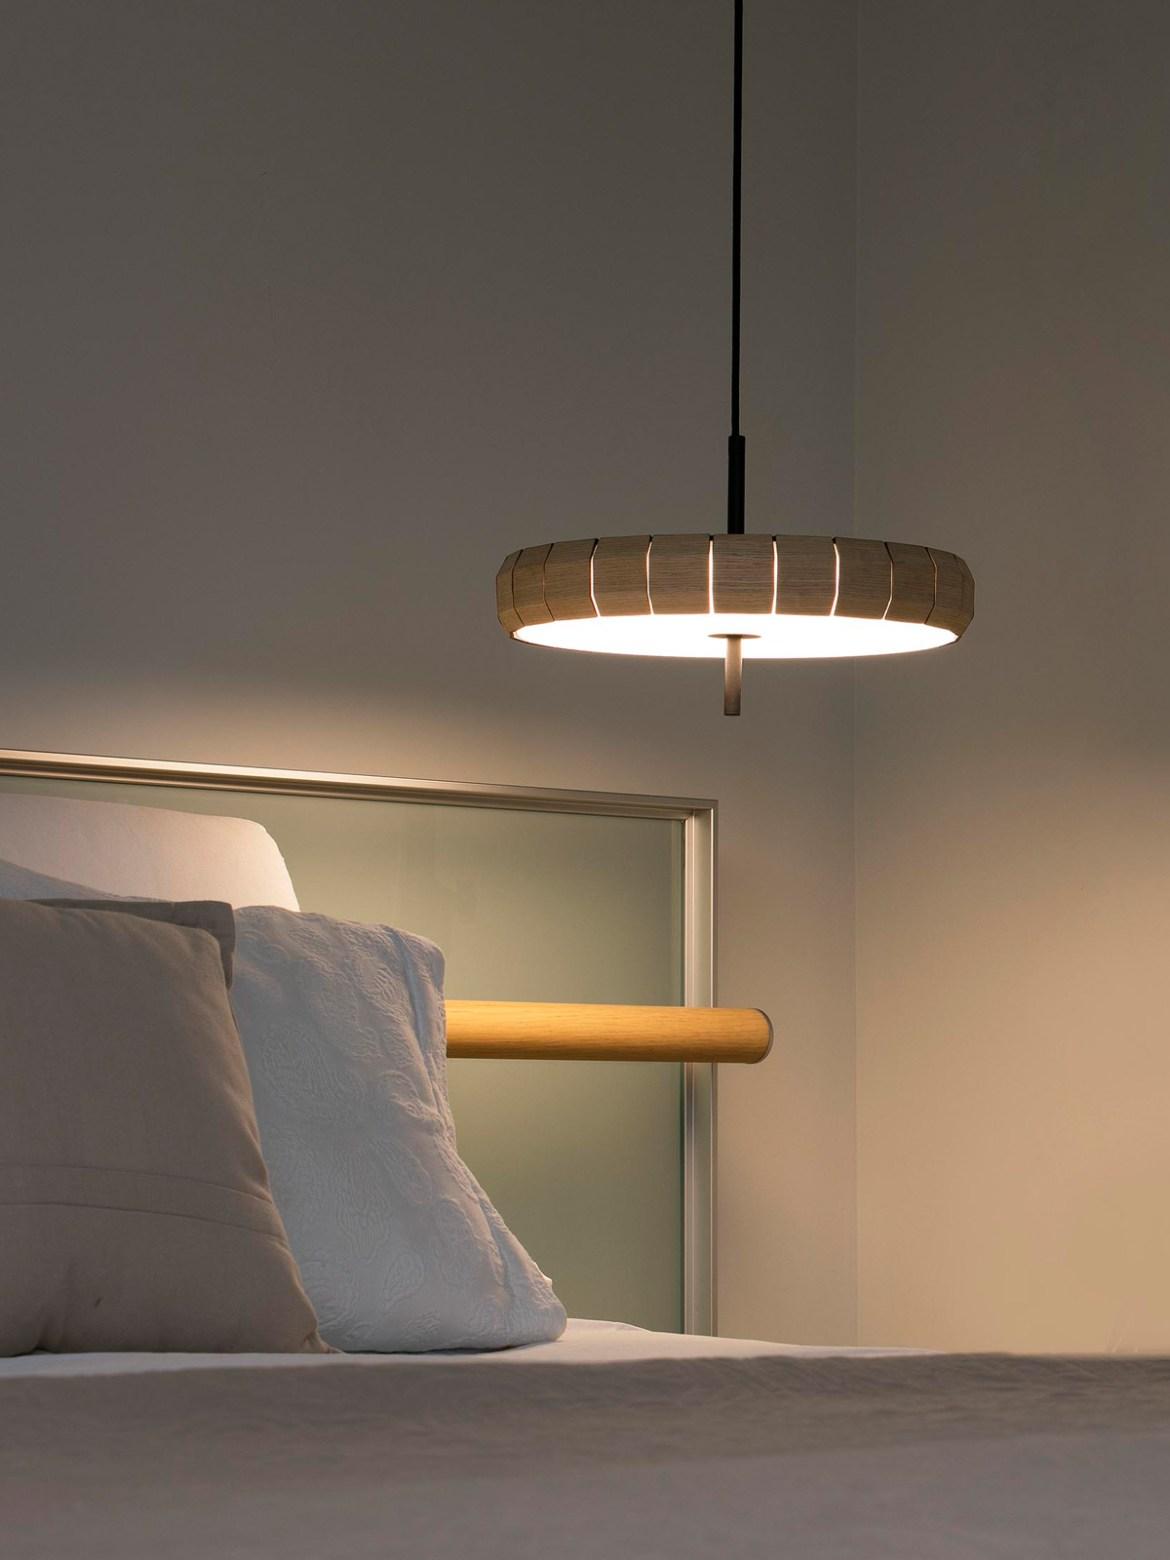 DesignOrt Blog: Designer im Portrait: Nahtrang spanische LED Lampe Phill Faro